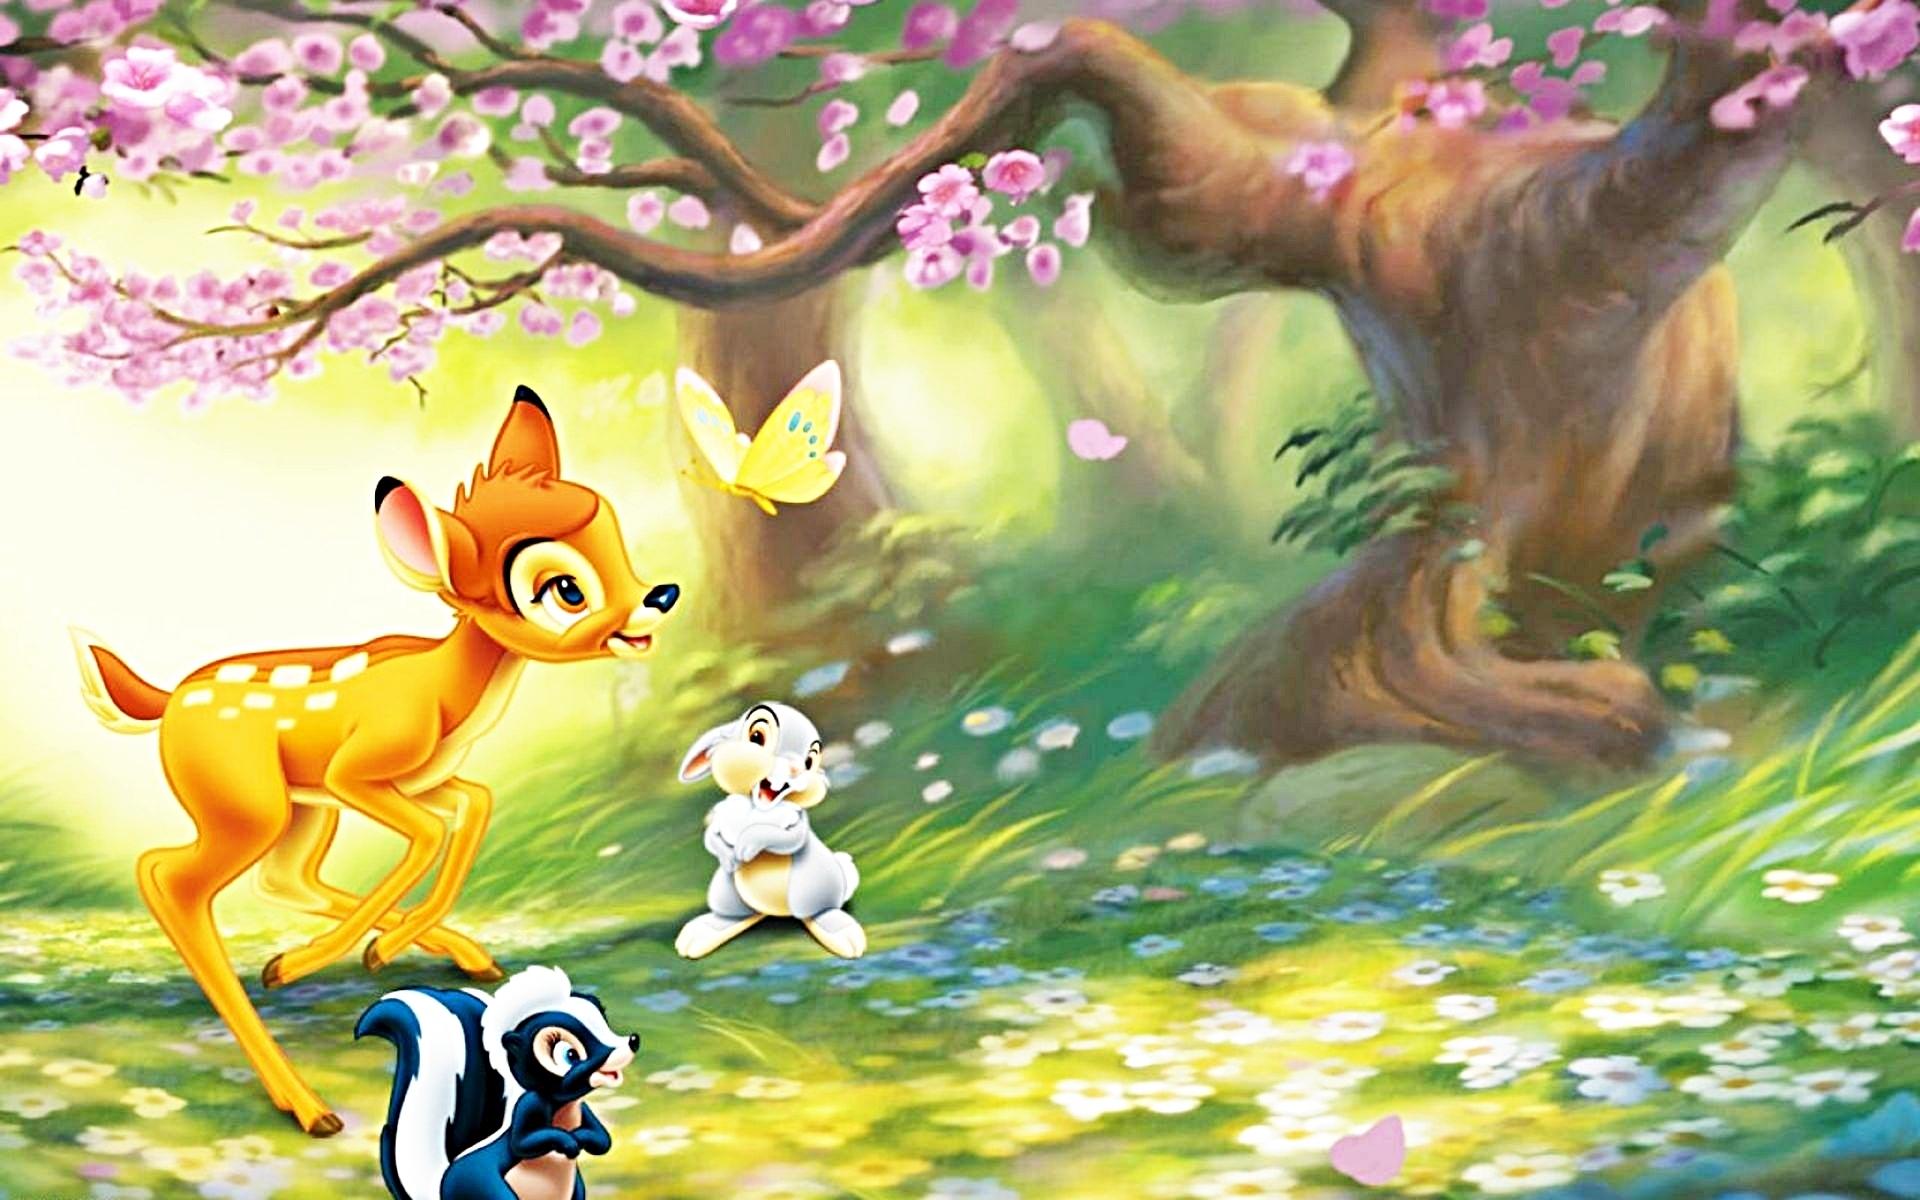 Disney s Bambi Wallpaper walt disney characters 21298906 1920 1200jpg 1920x1200